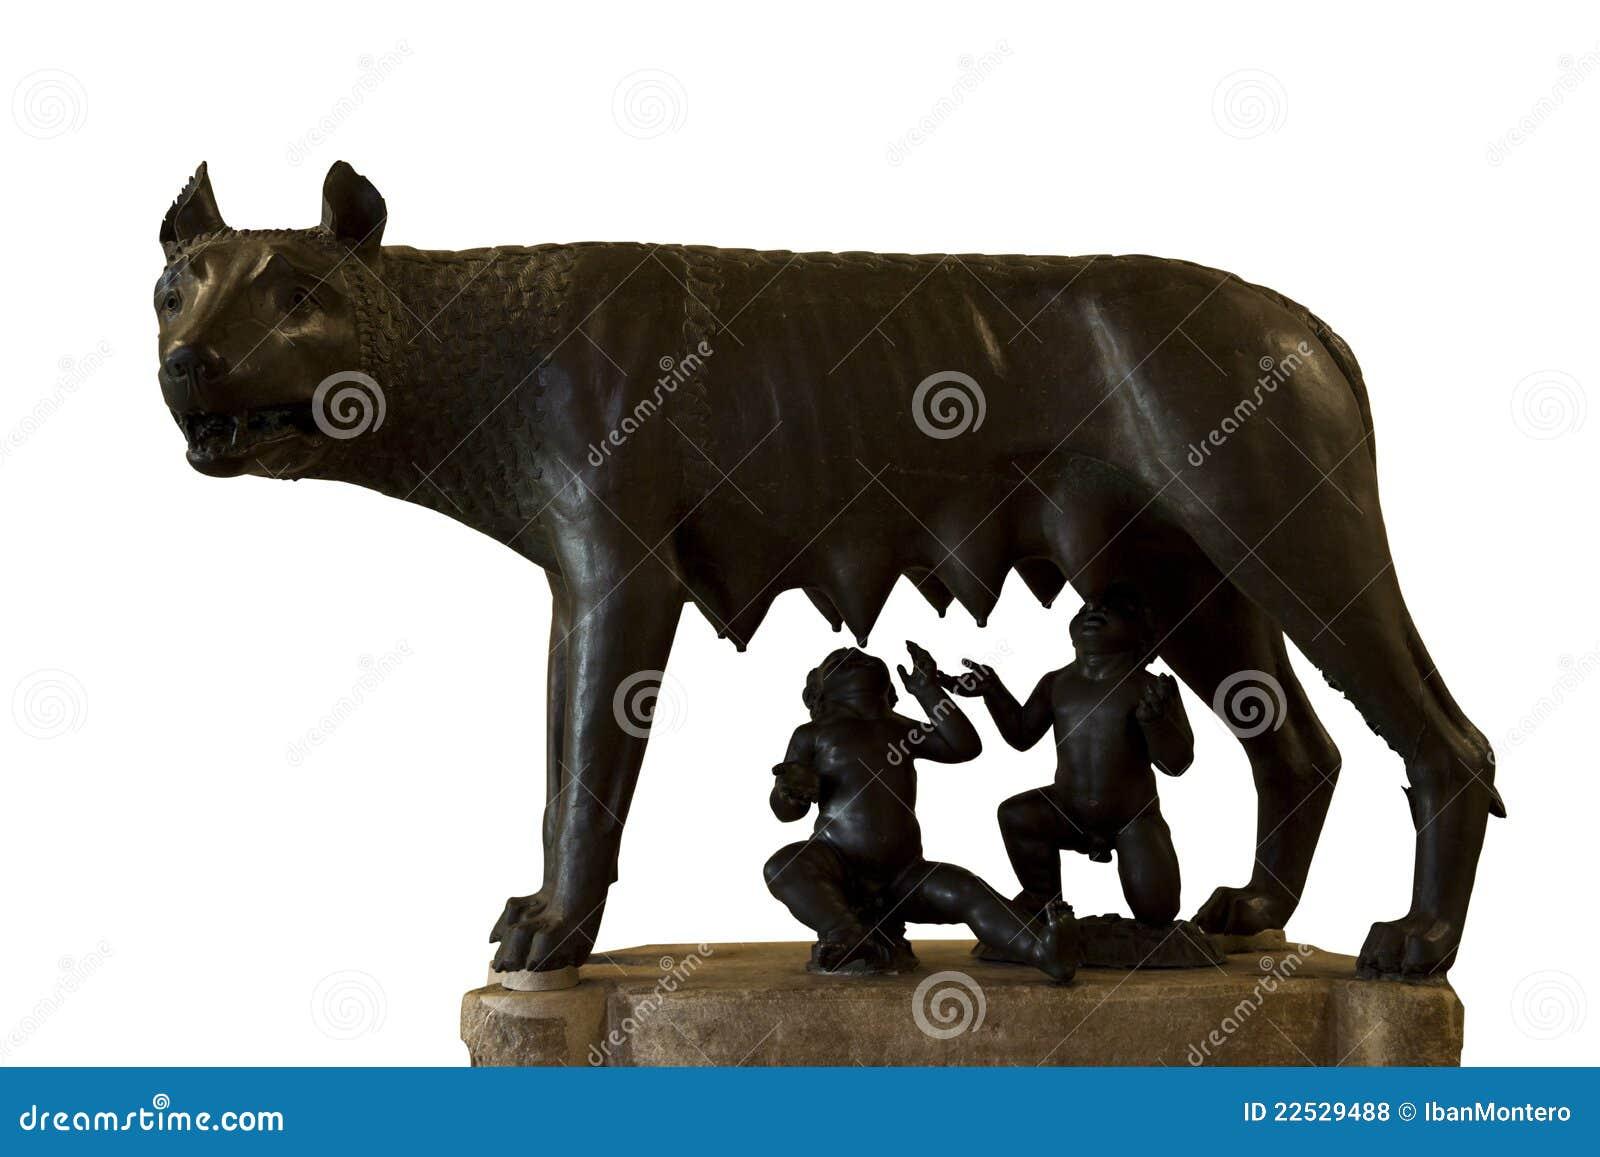 Romulus And Remus Rome Symbol Royalty Free Stock Photos Image 22529488